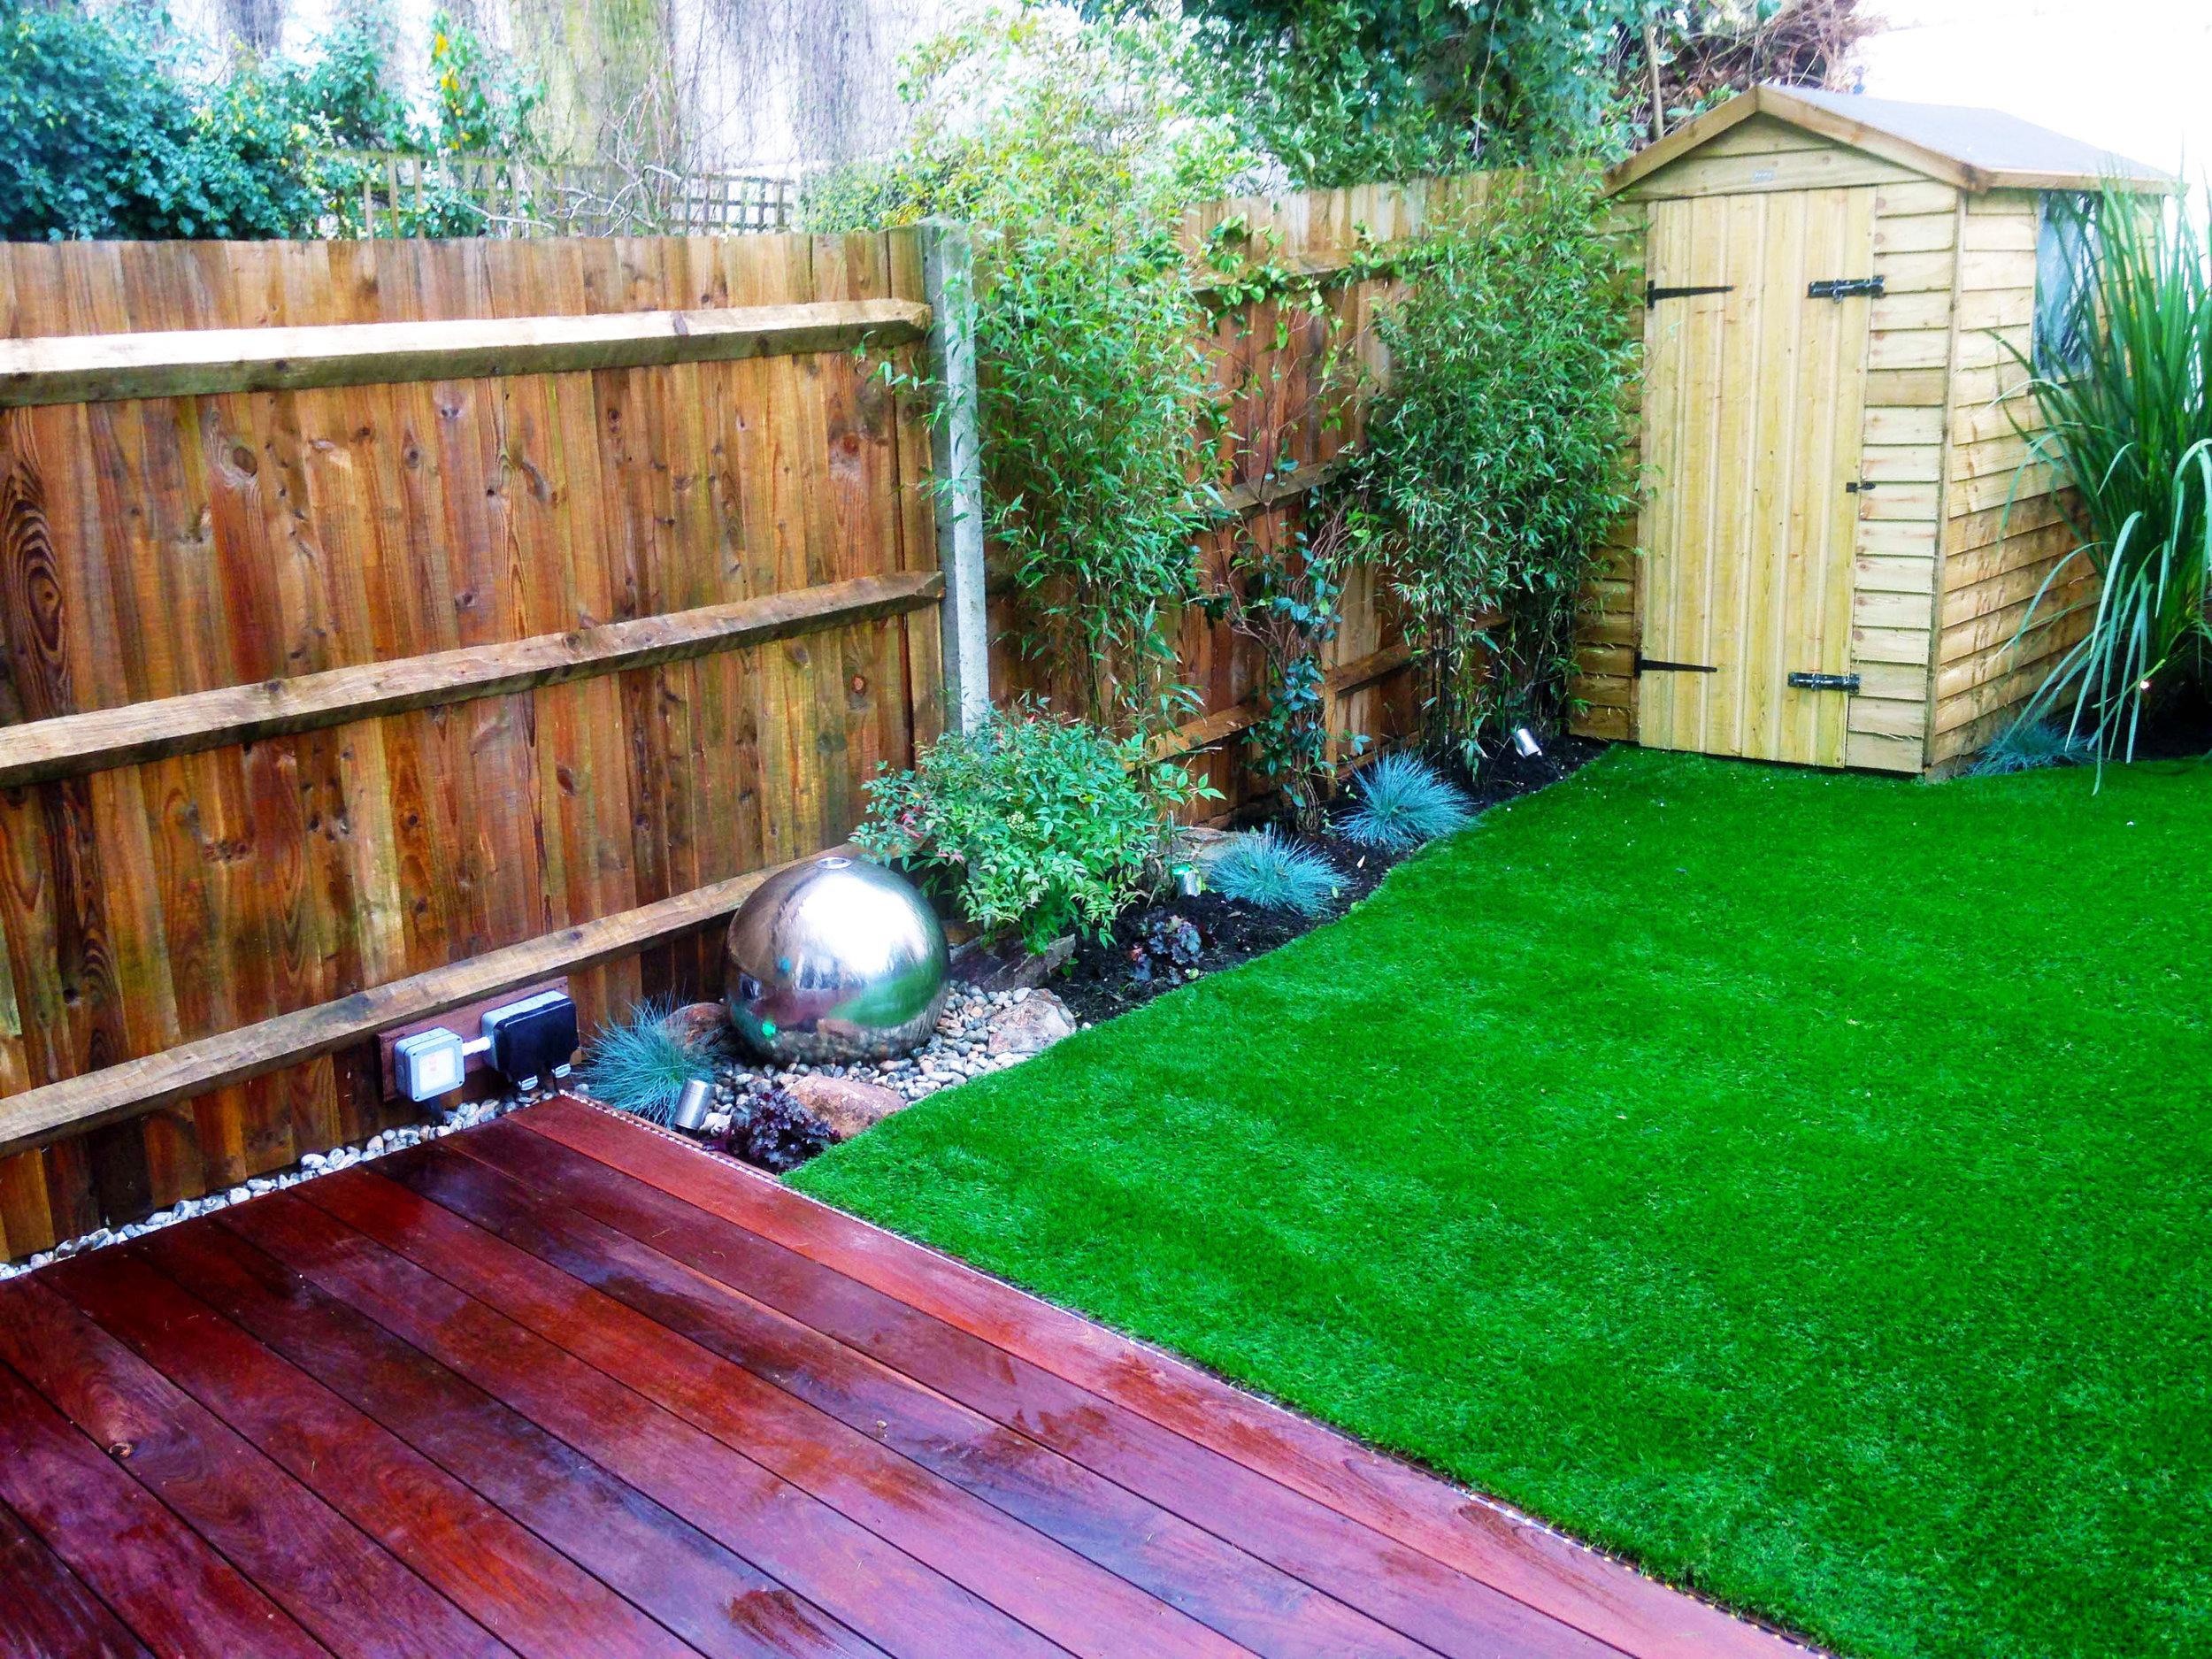 Decking-artificial-turf---Gallagher-gardens---Landscaping-Oxford.jpg